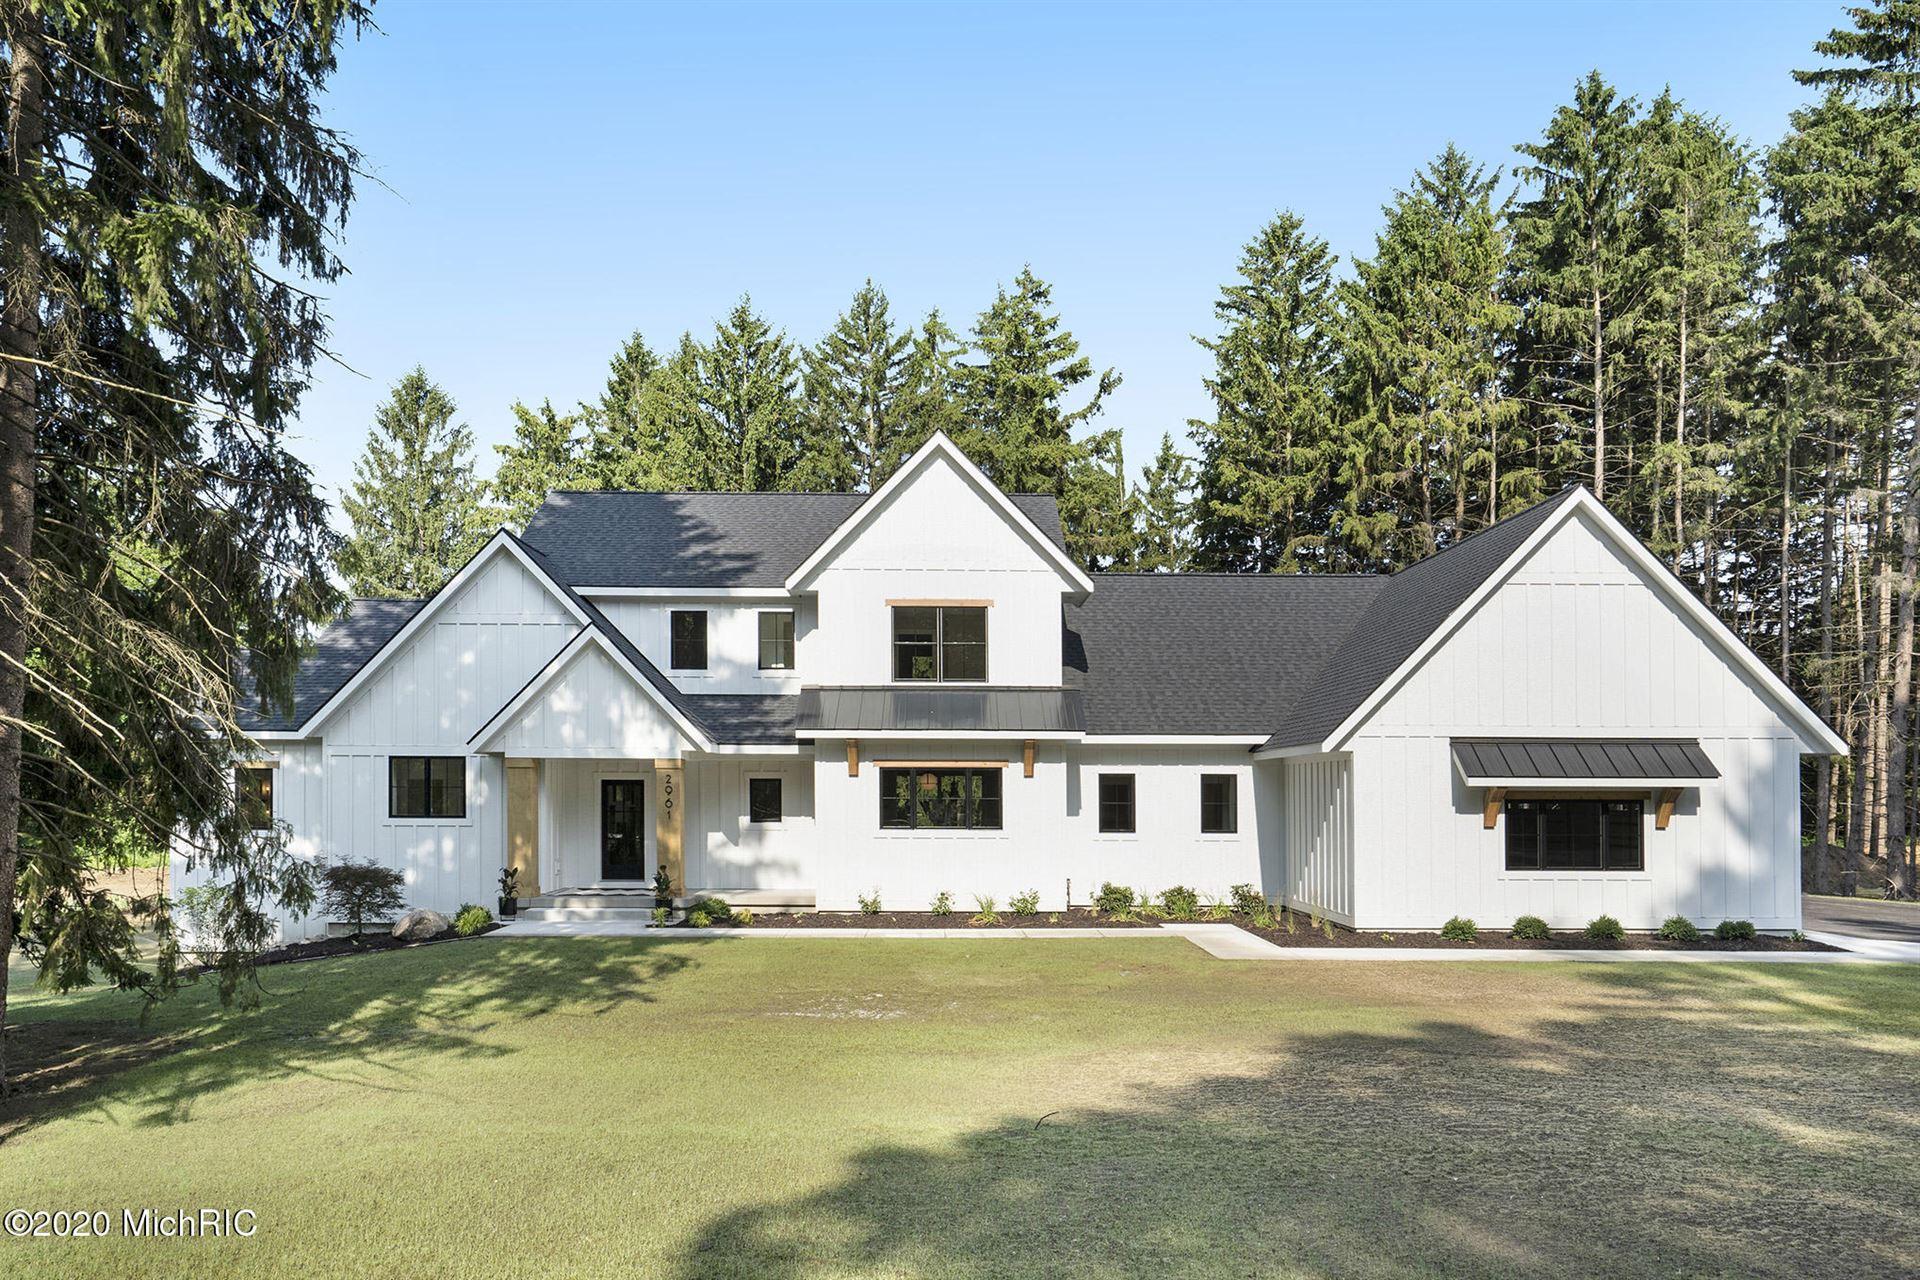 Photo of 5108 Hickory Pointe Woods SE, Ada, MI 49301 (MLS # 20050891)